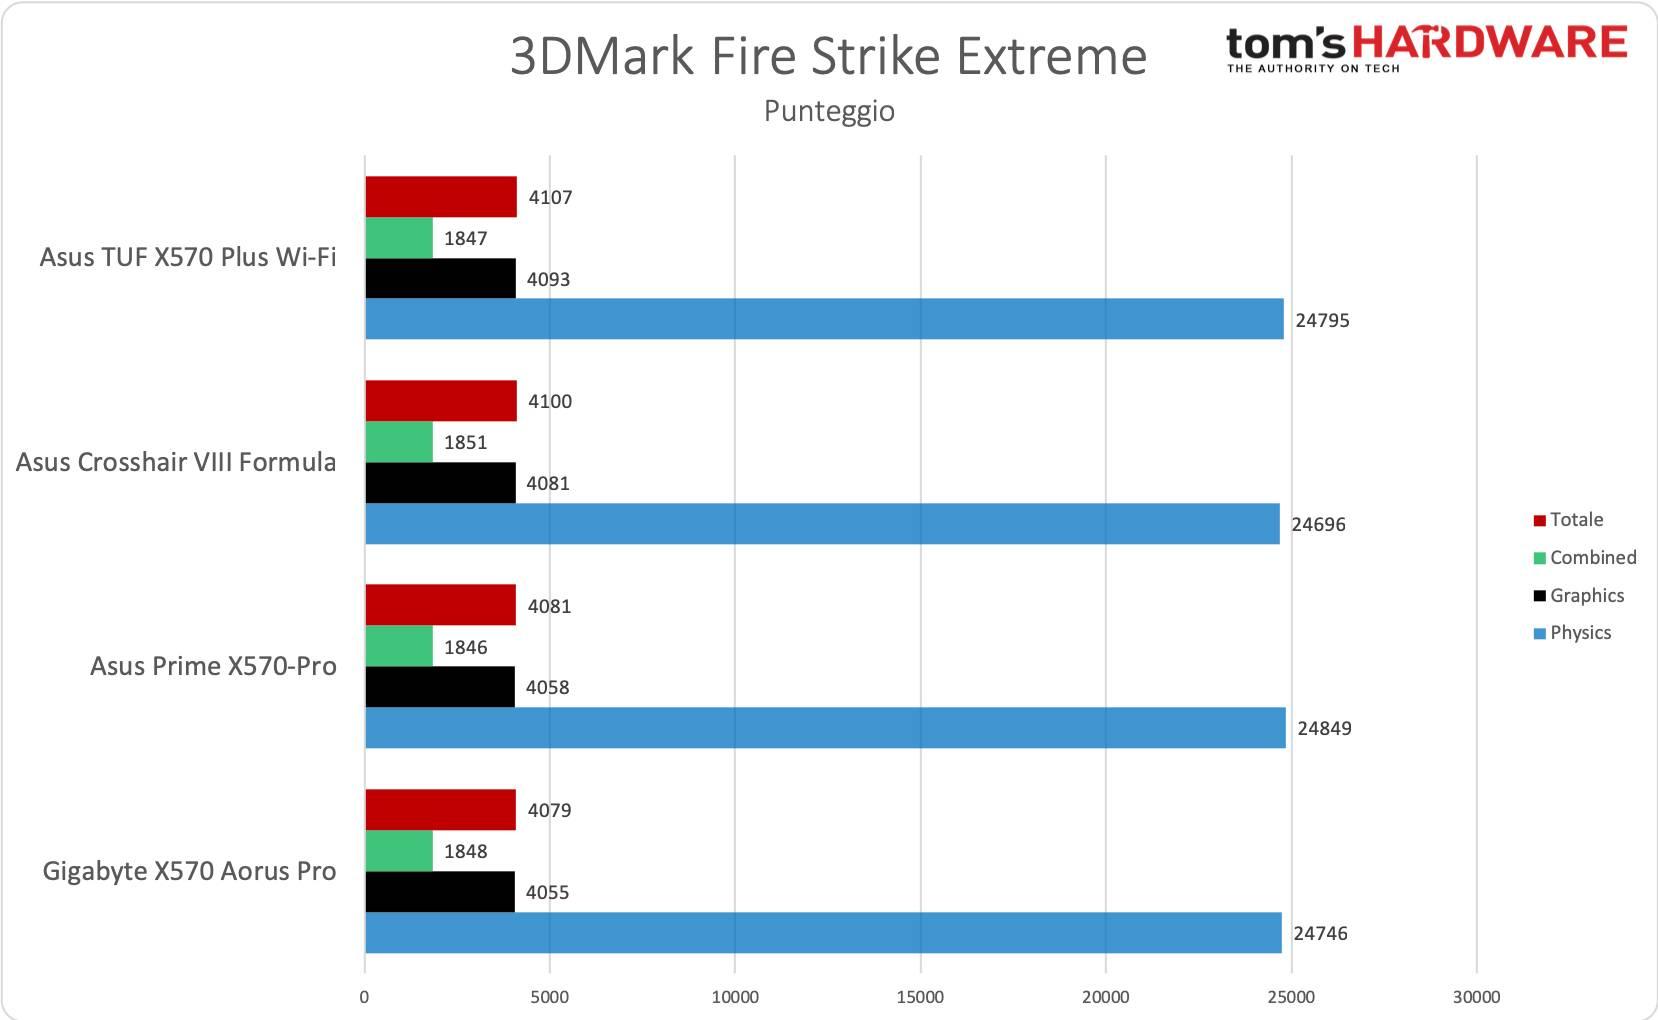 Crosshair VIII Formula - 3DMark Fire Strike